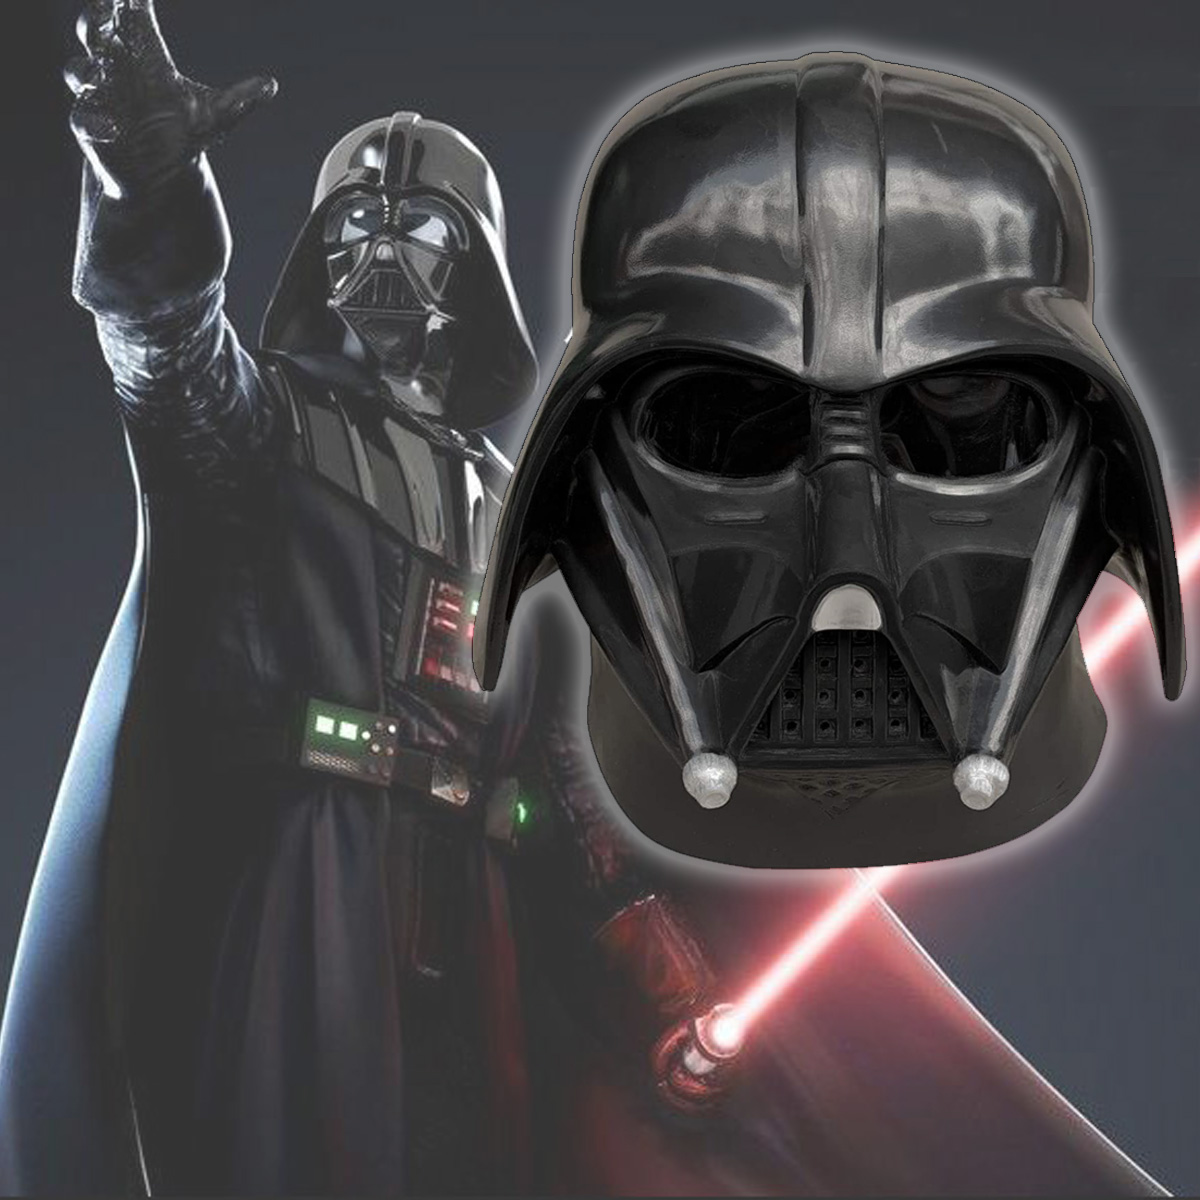 Hot Sale Mask Darth Vader Helmet Adult Pvc Seth Lord Darth Vader Anakin Skywalker Masks For Halloween Cosplay Prop Boys Costume Accessories Aliexpress